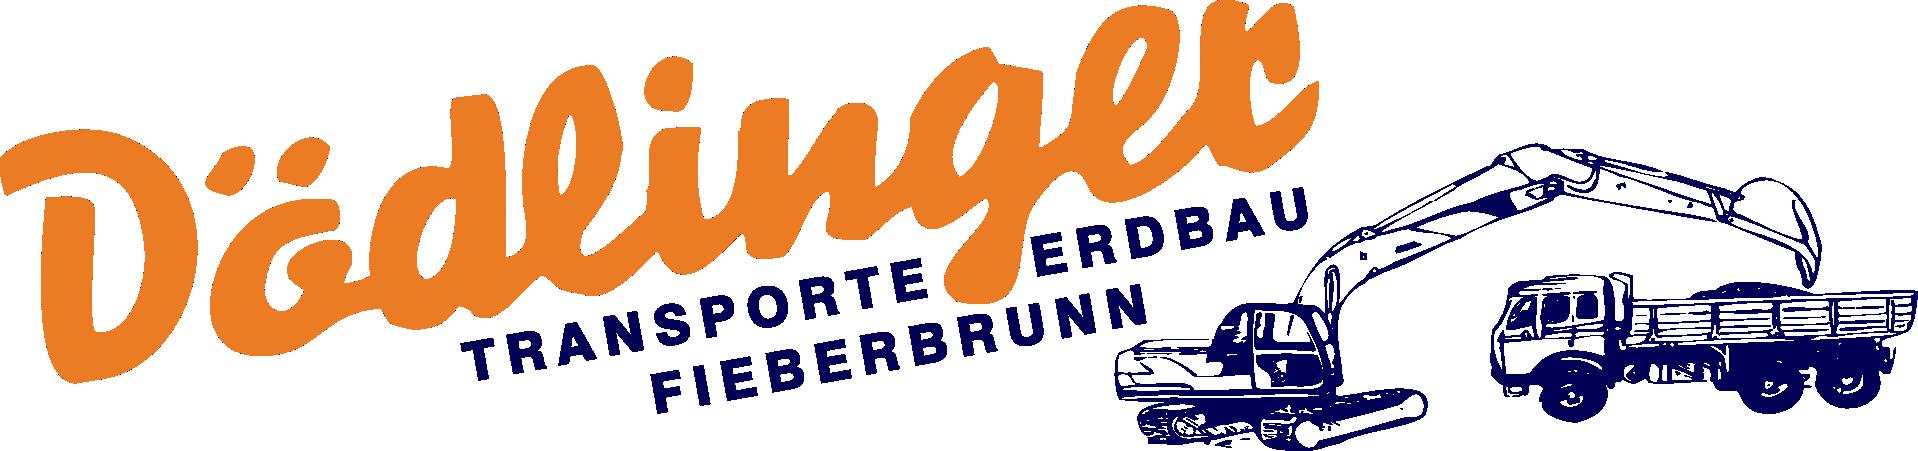 Dödlinger - Erdbau